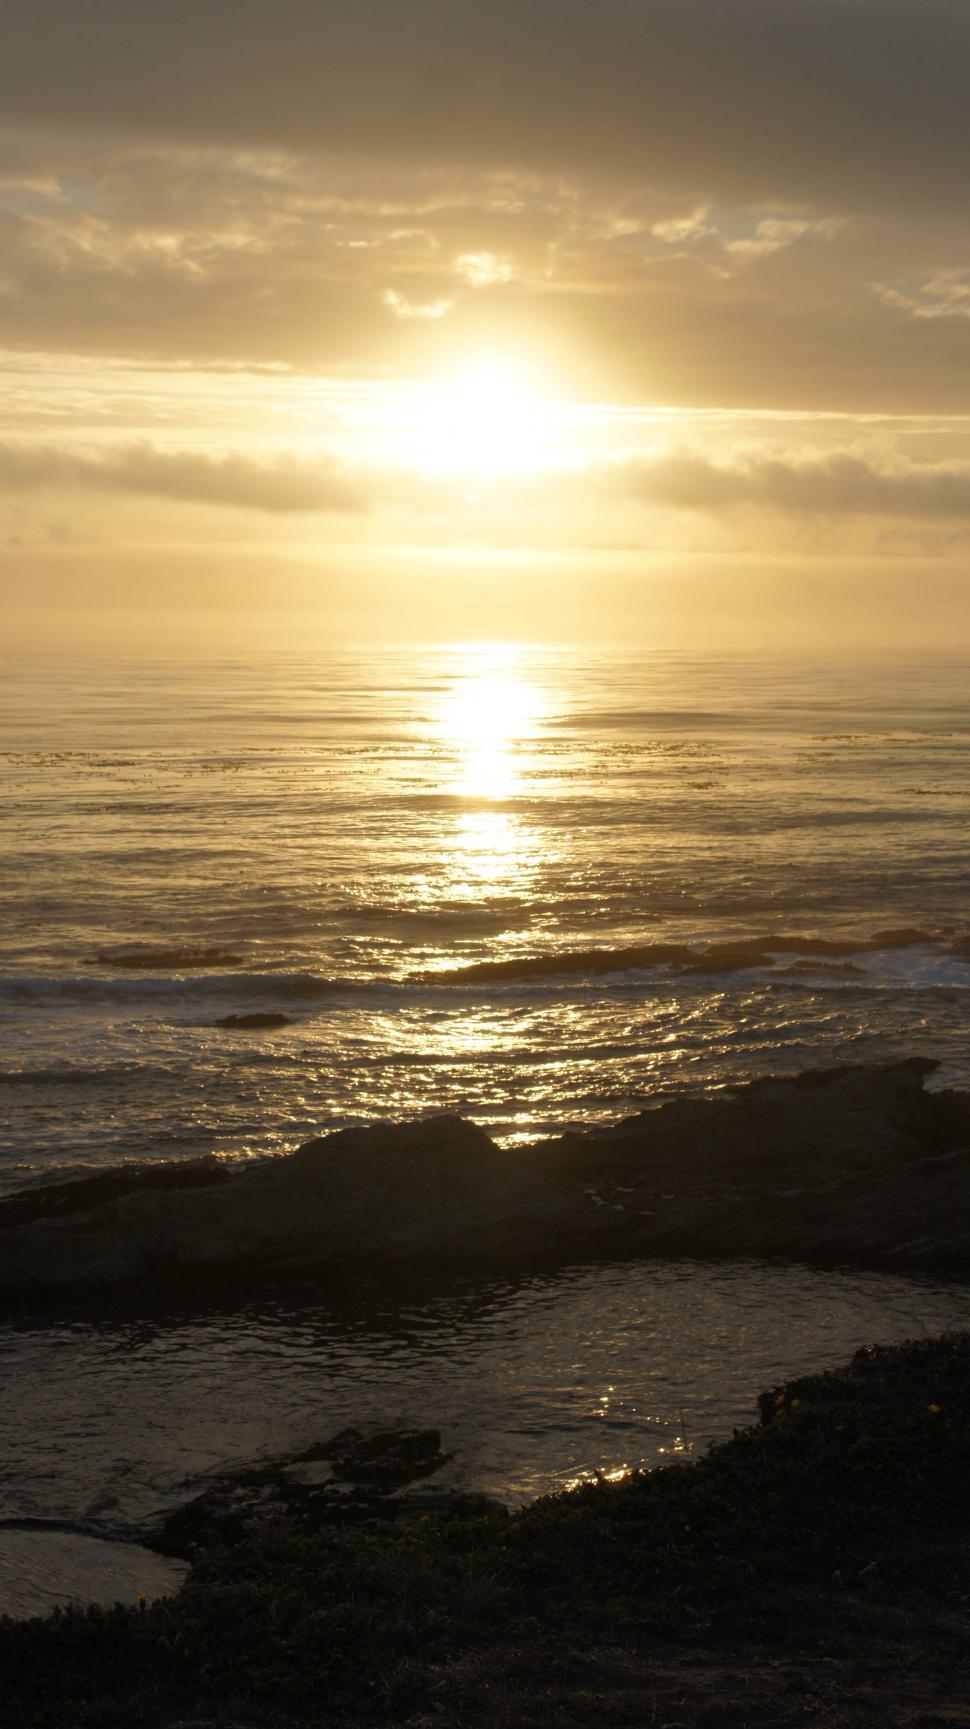 Download Free Stock Photo of California Coastline at Sunset